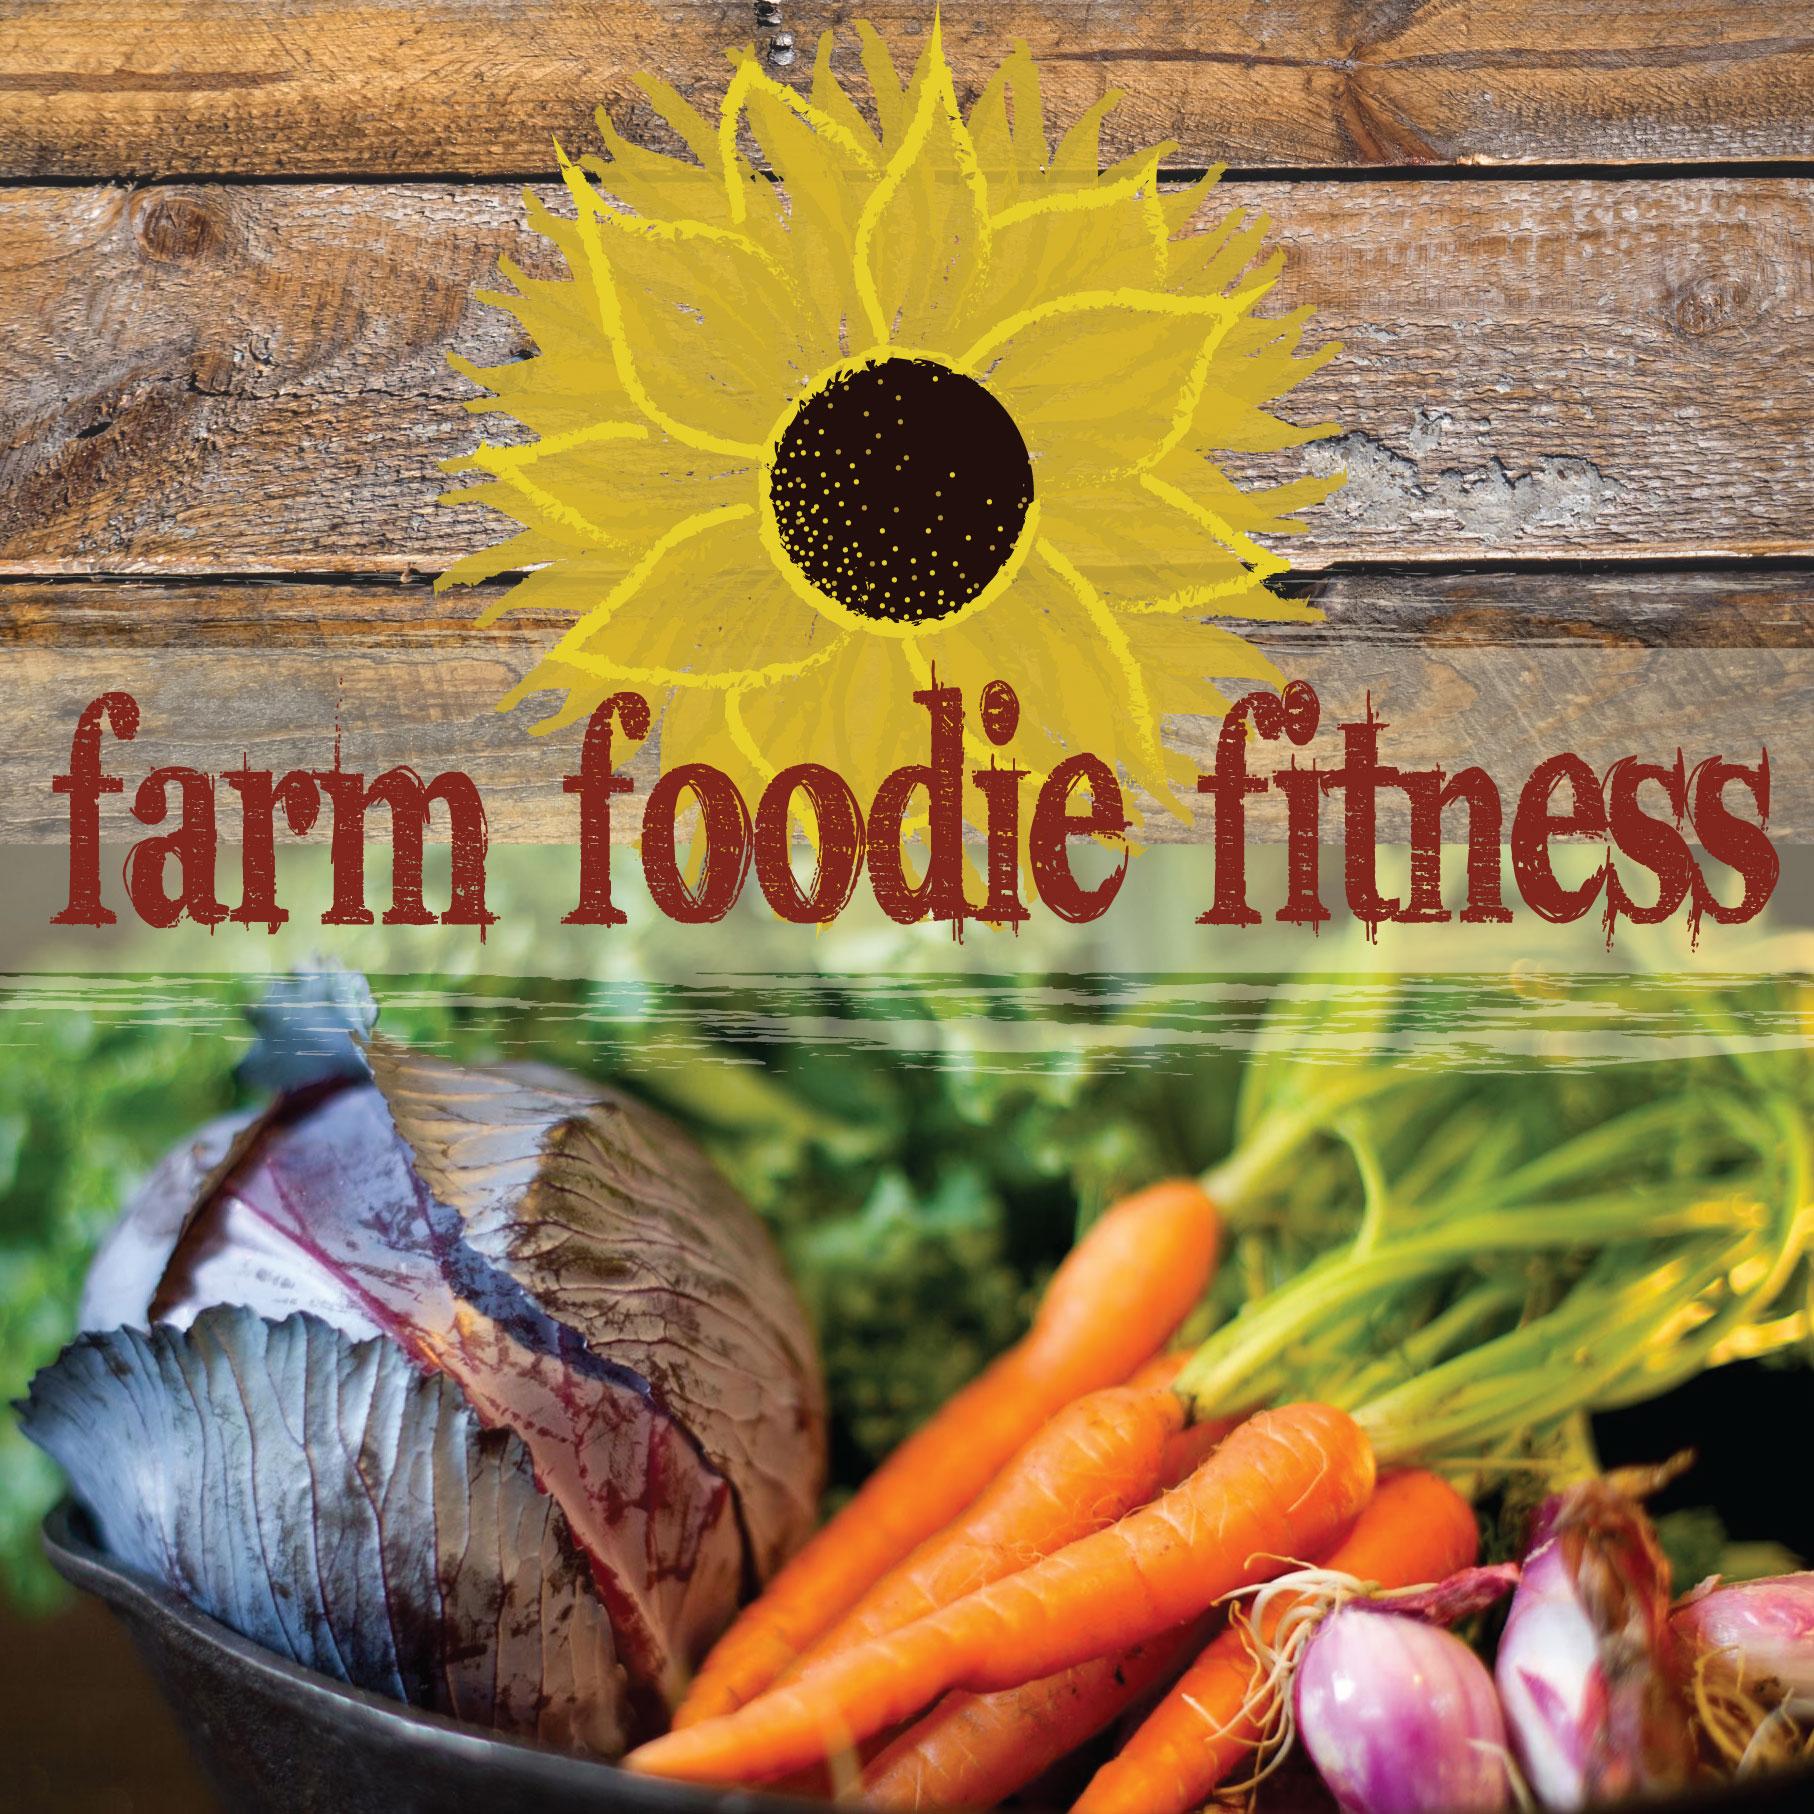 farmfoodiefitness-fB.jpg